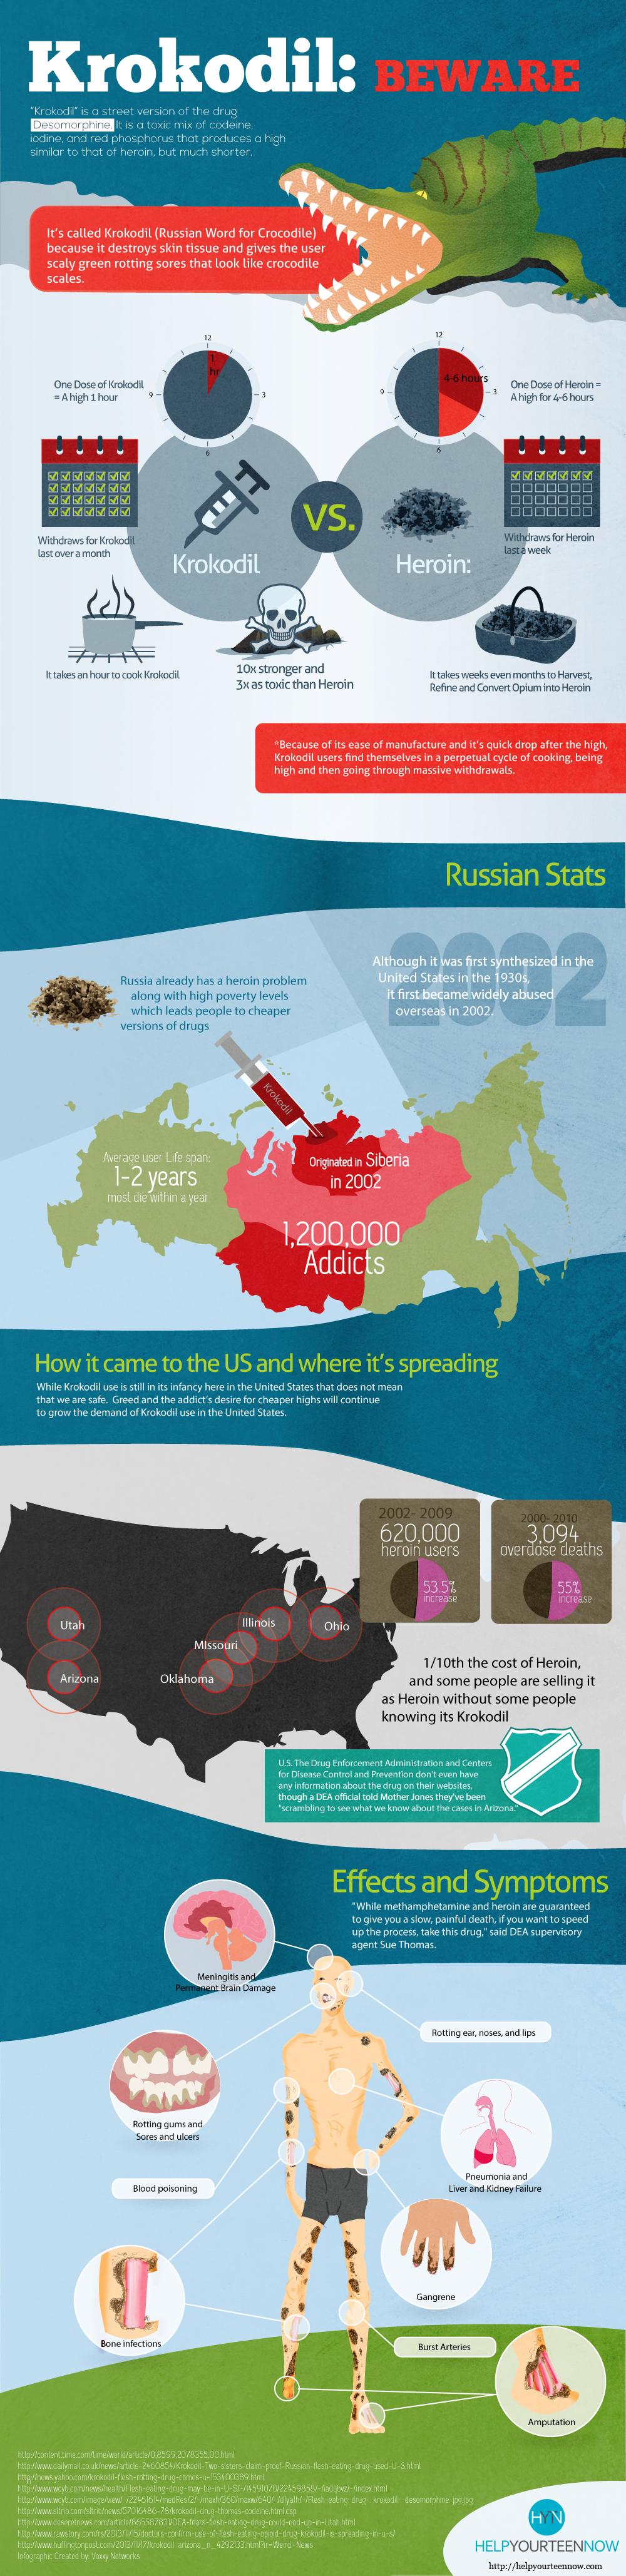 Krokodile_Beware_Infographic